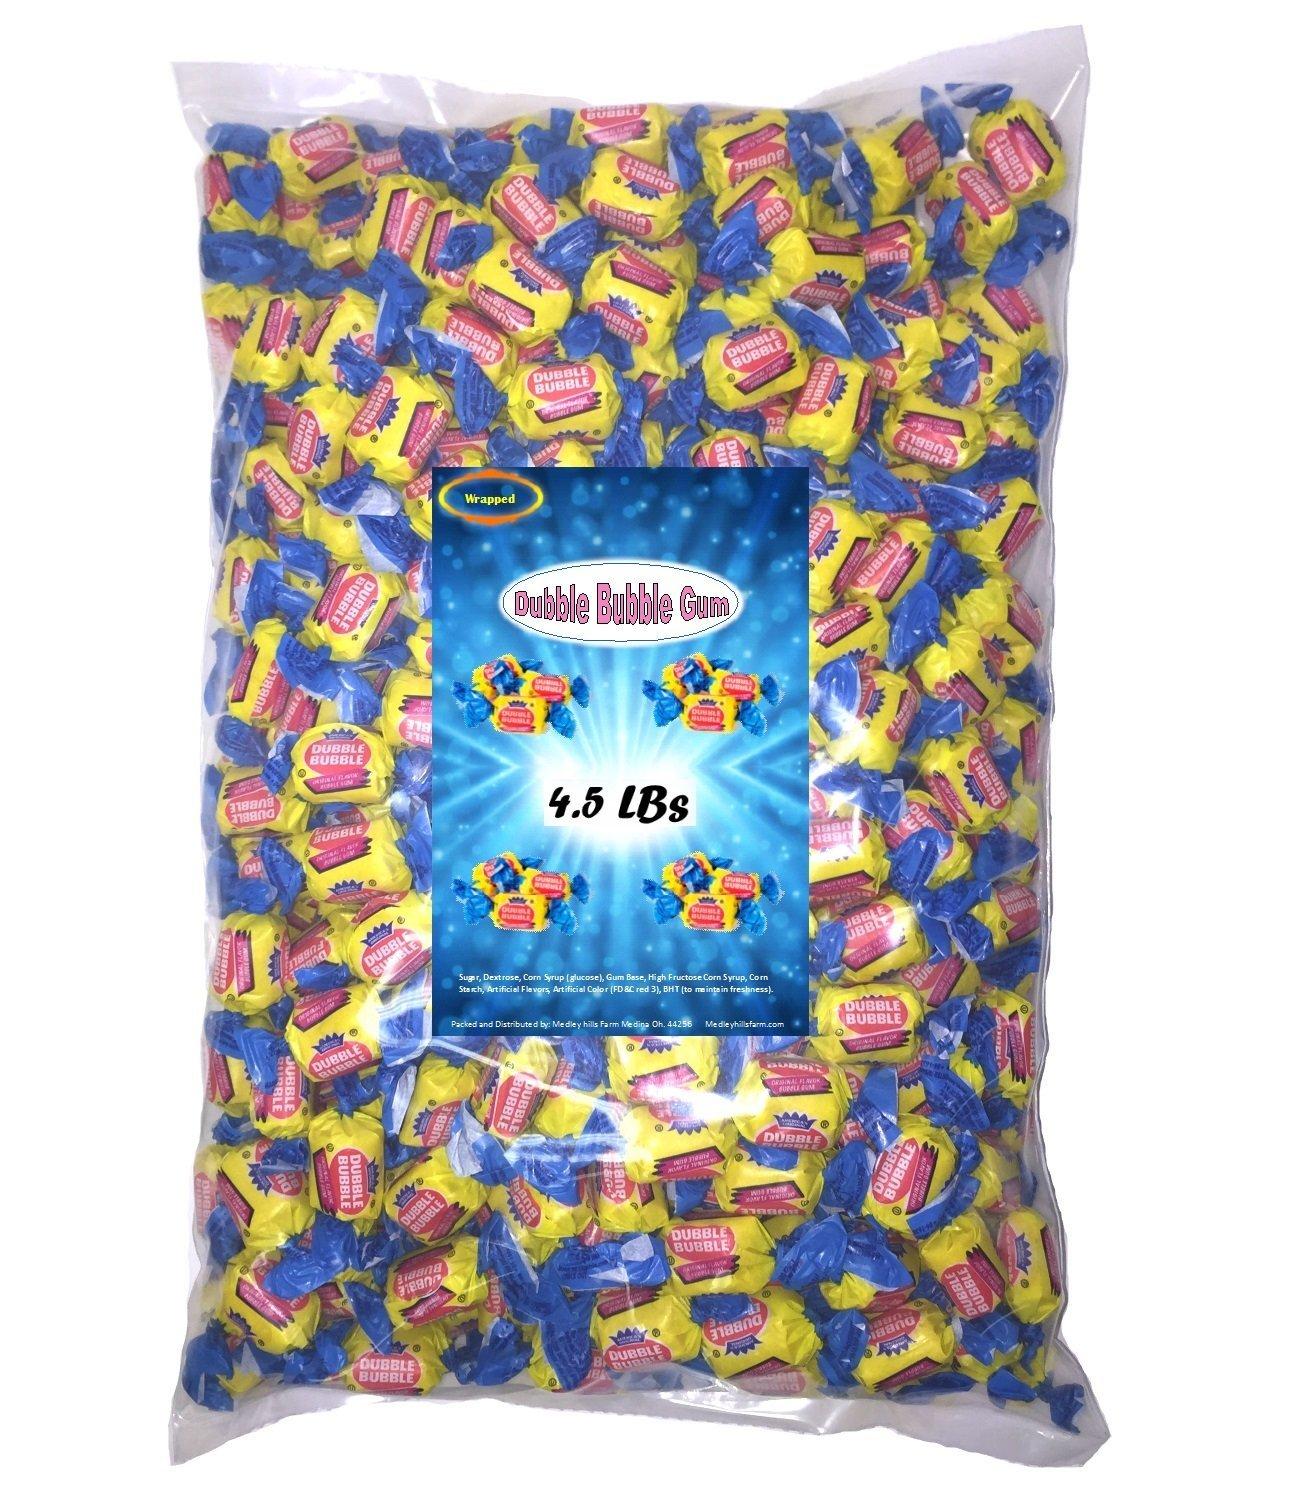 Dubble Bubble Gum 4.5 Lbs Original Flavor Individually Wrapped